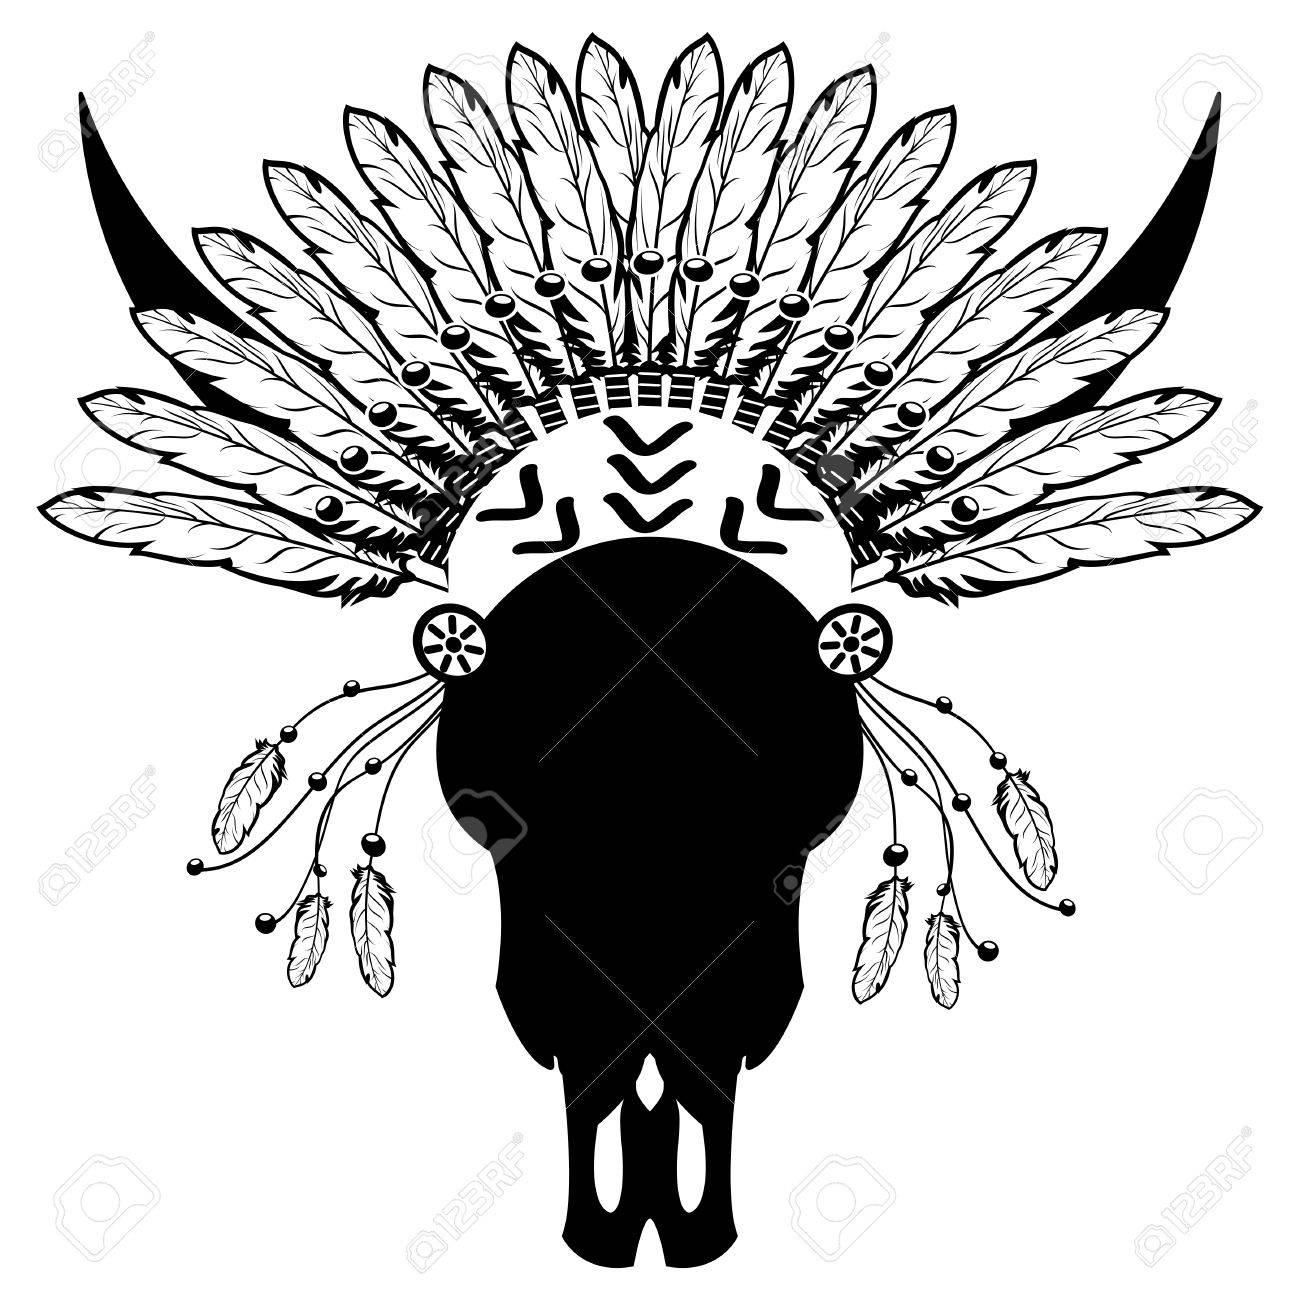 1300x1300 Warrior Style Wild Animal Skull With Tribal Headdress With Plain